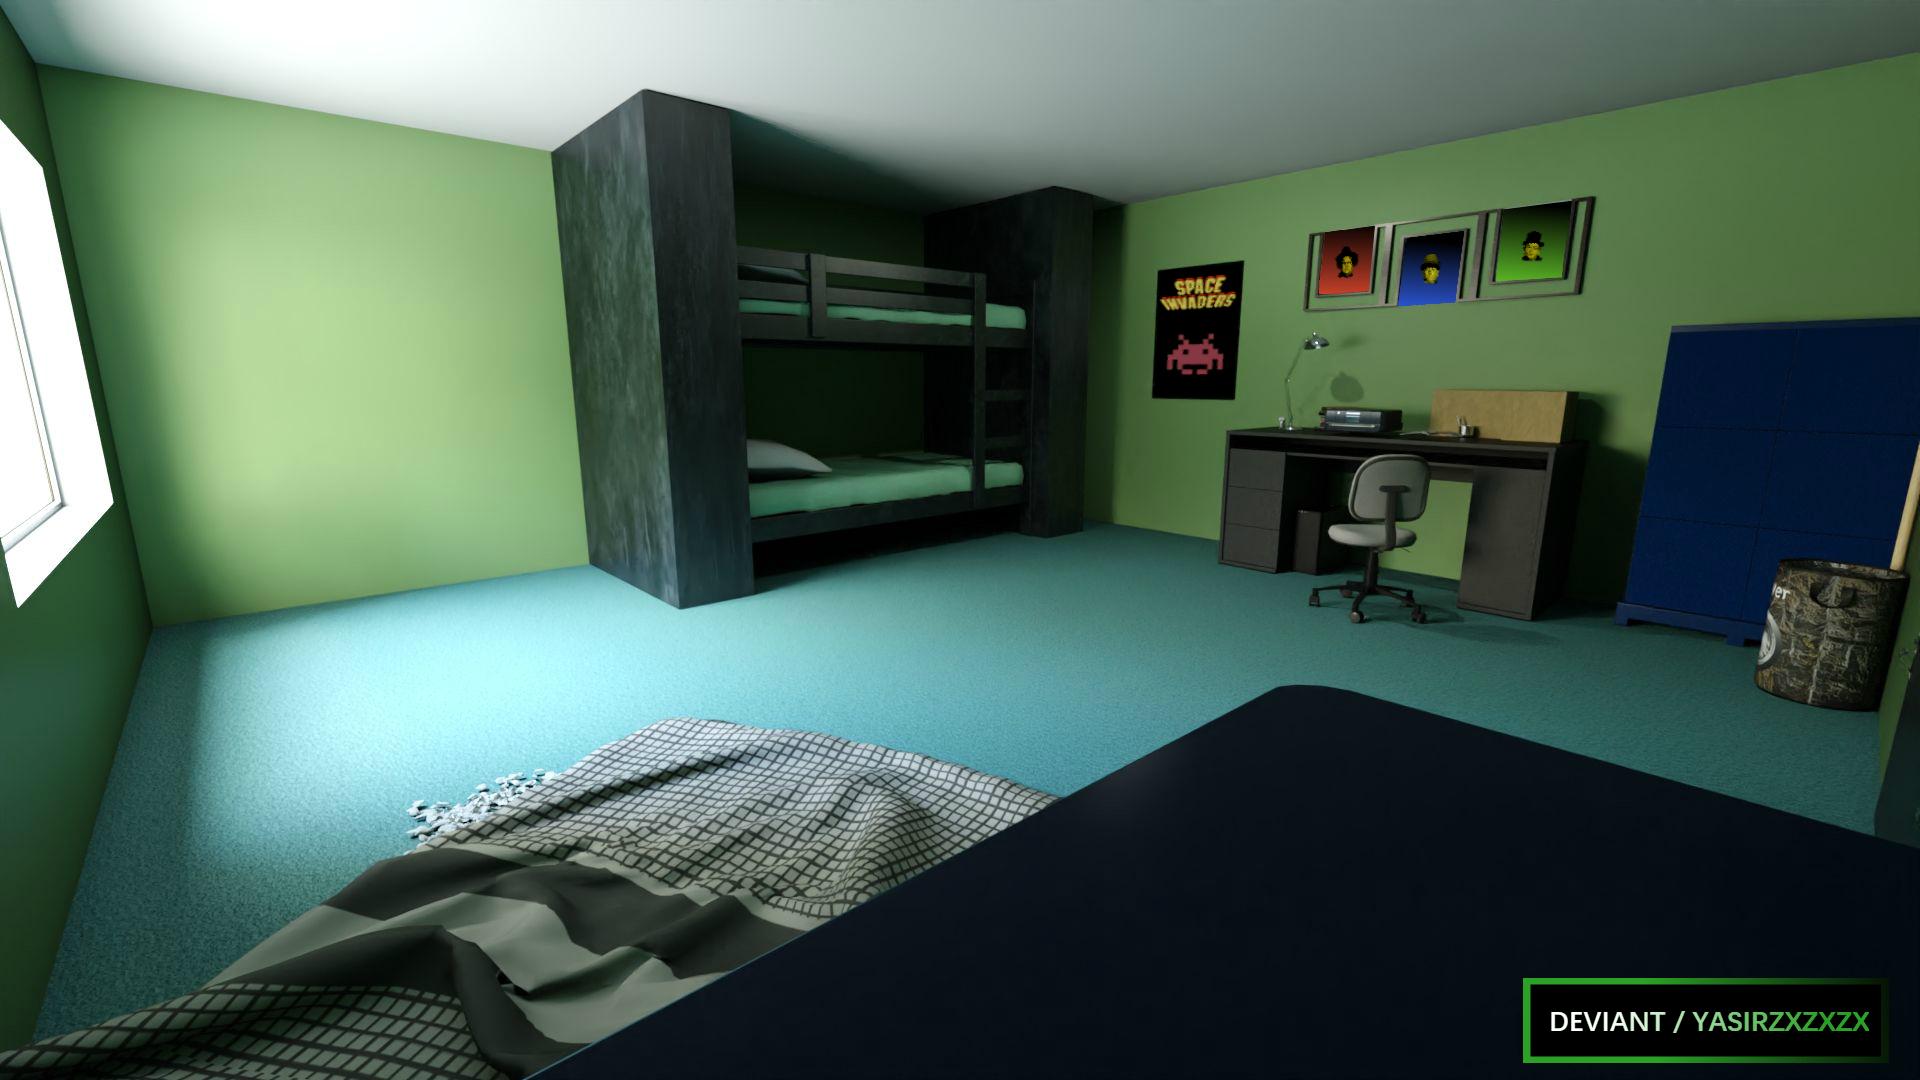 Teen Titans Beastboy S Room By Yasirzxzxzx On Deviantart